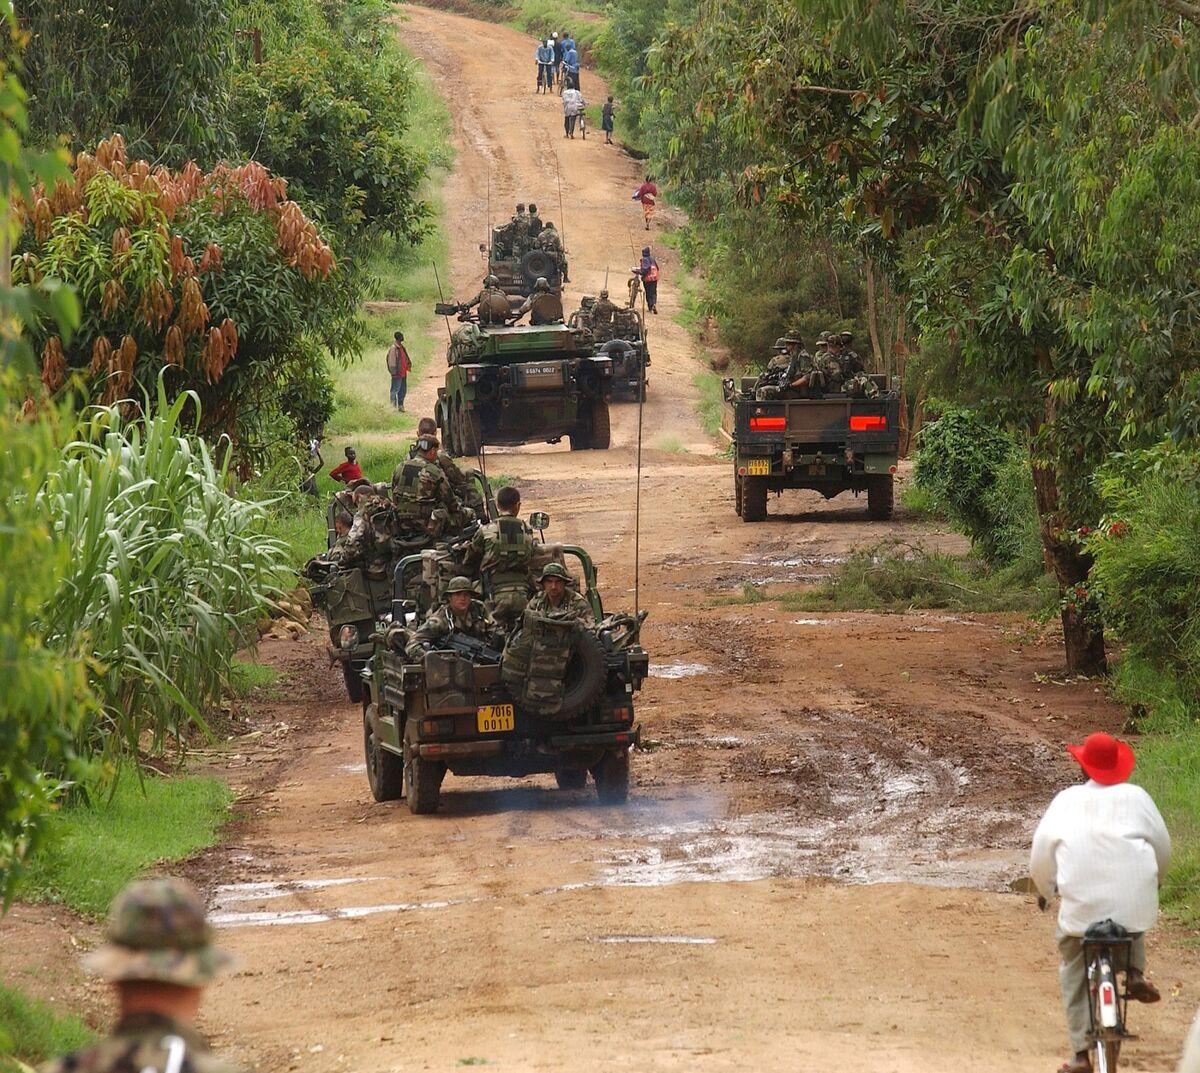 Switzerland Investigates Metal Trader Over Congo-War Allegations